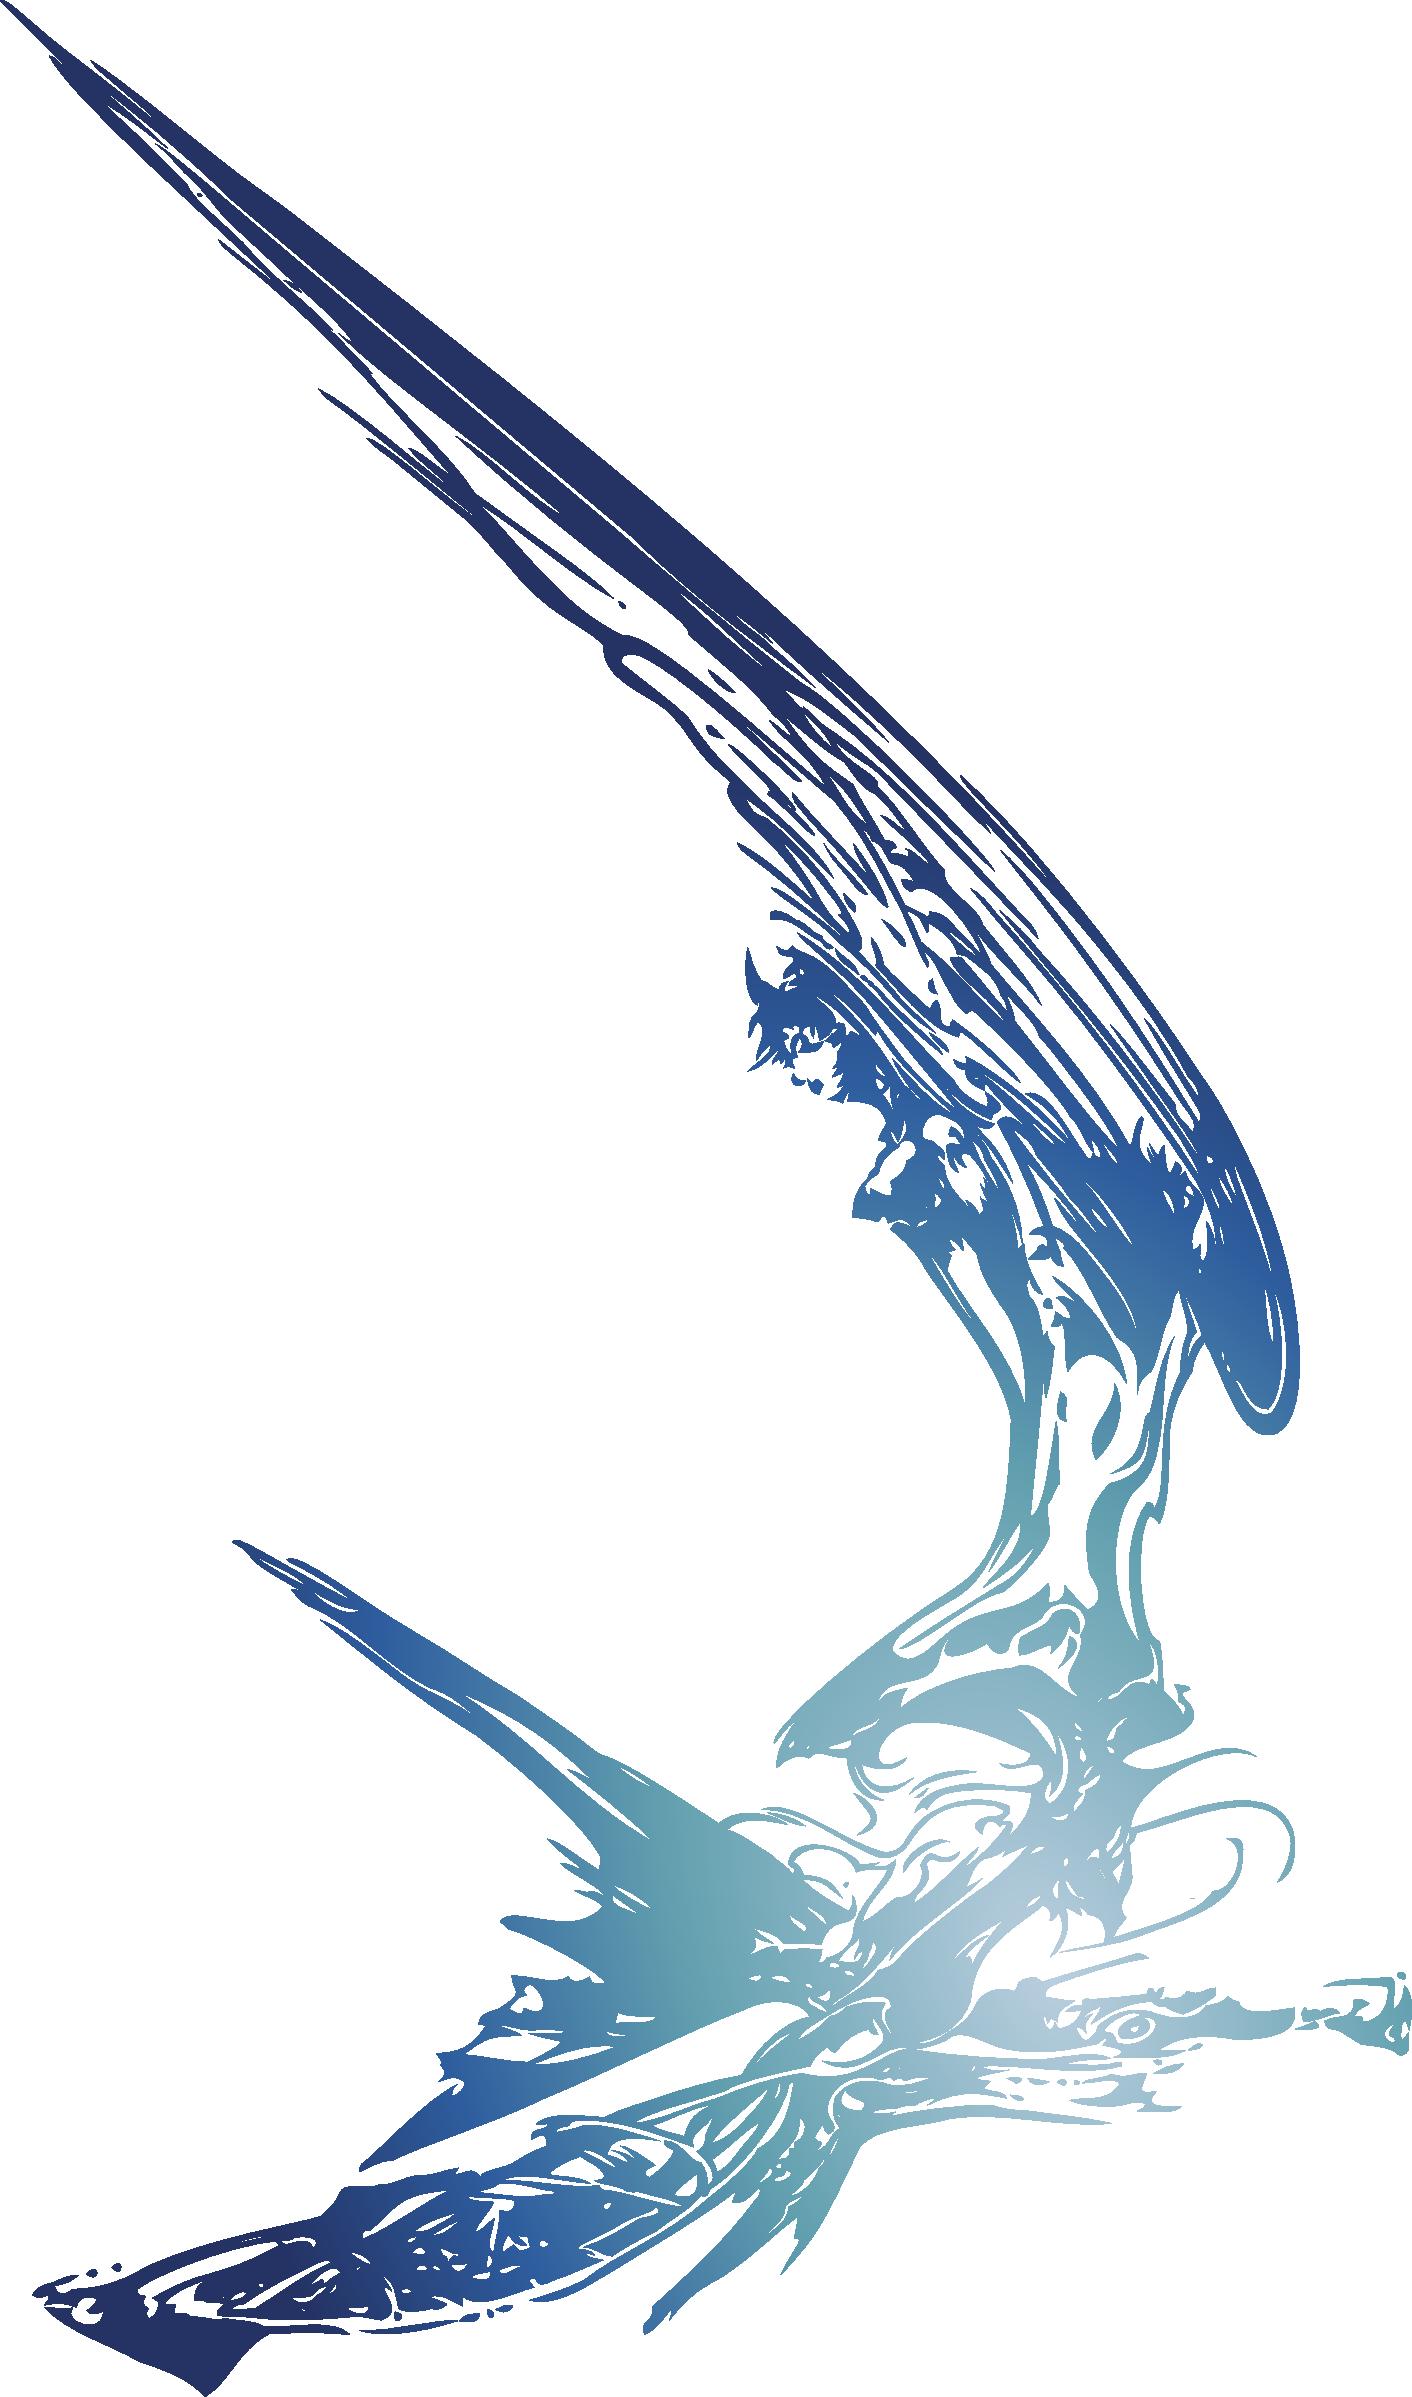 Final Fantasy XII Revenant Wings Art dessin, Dessin